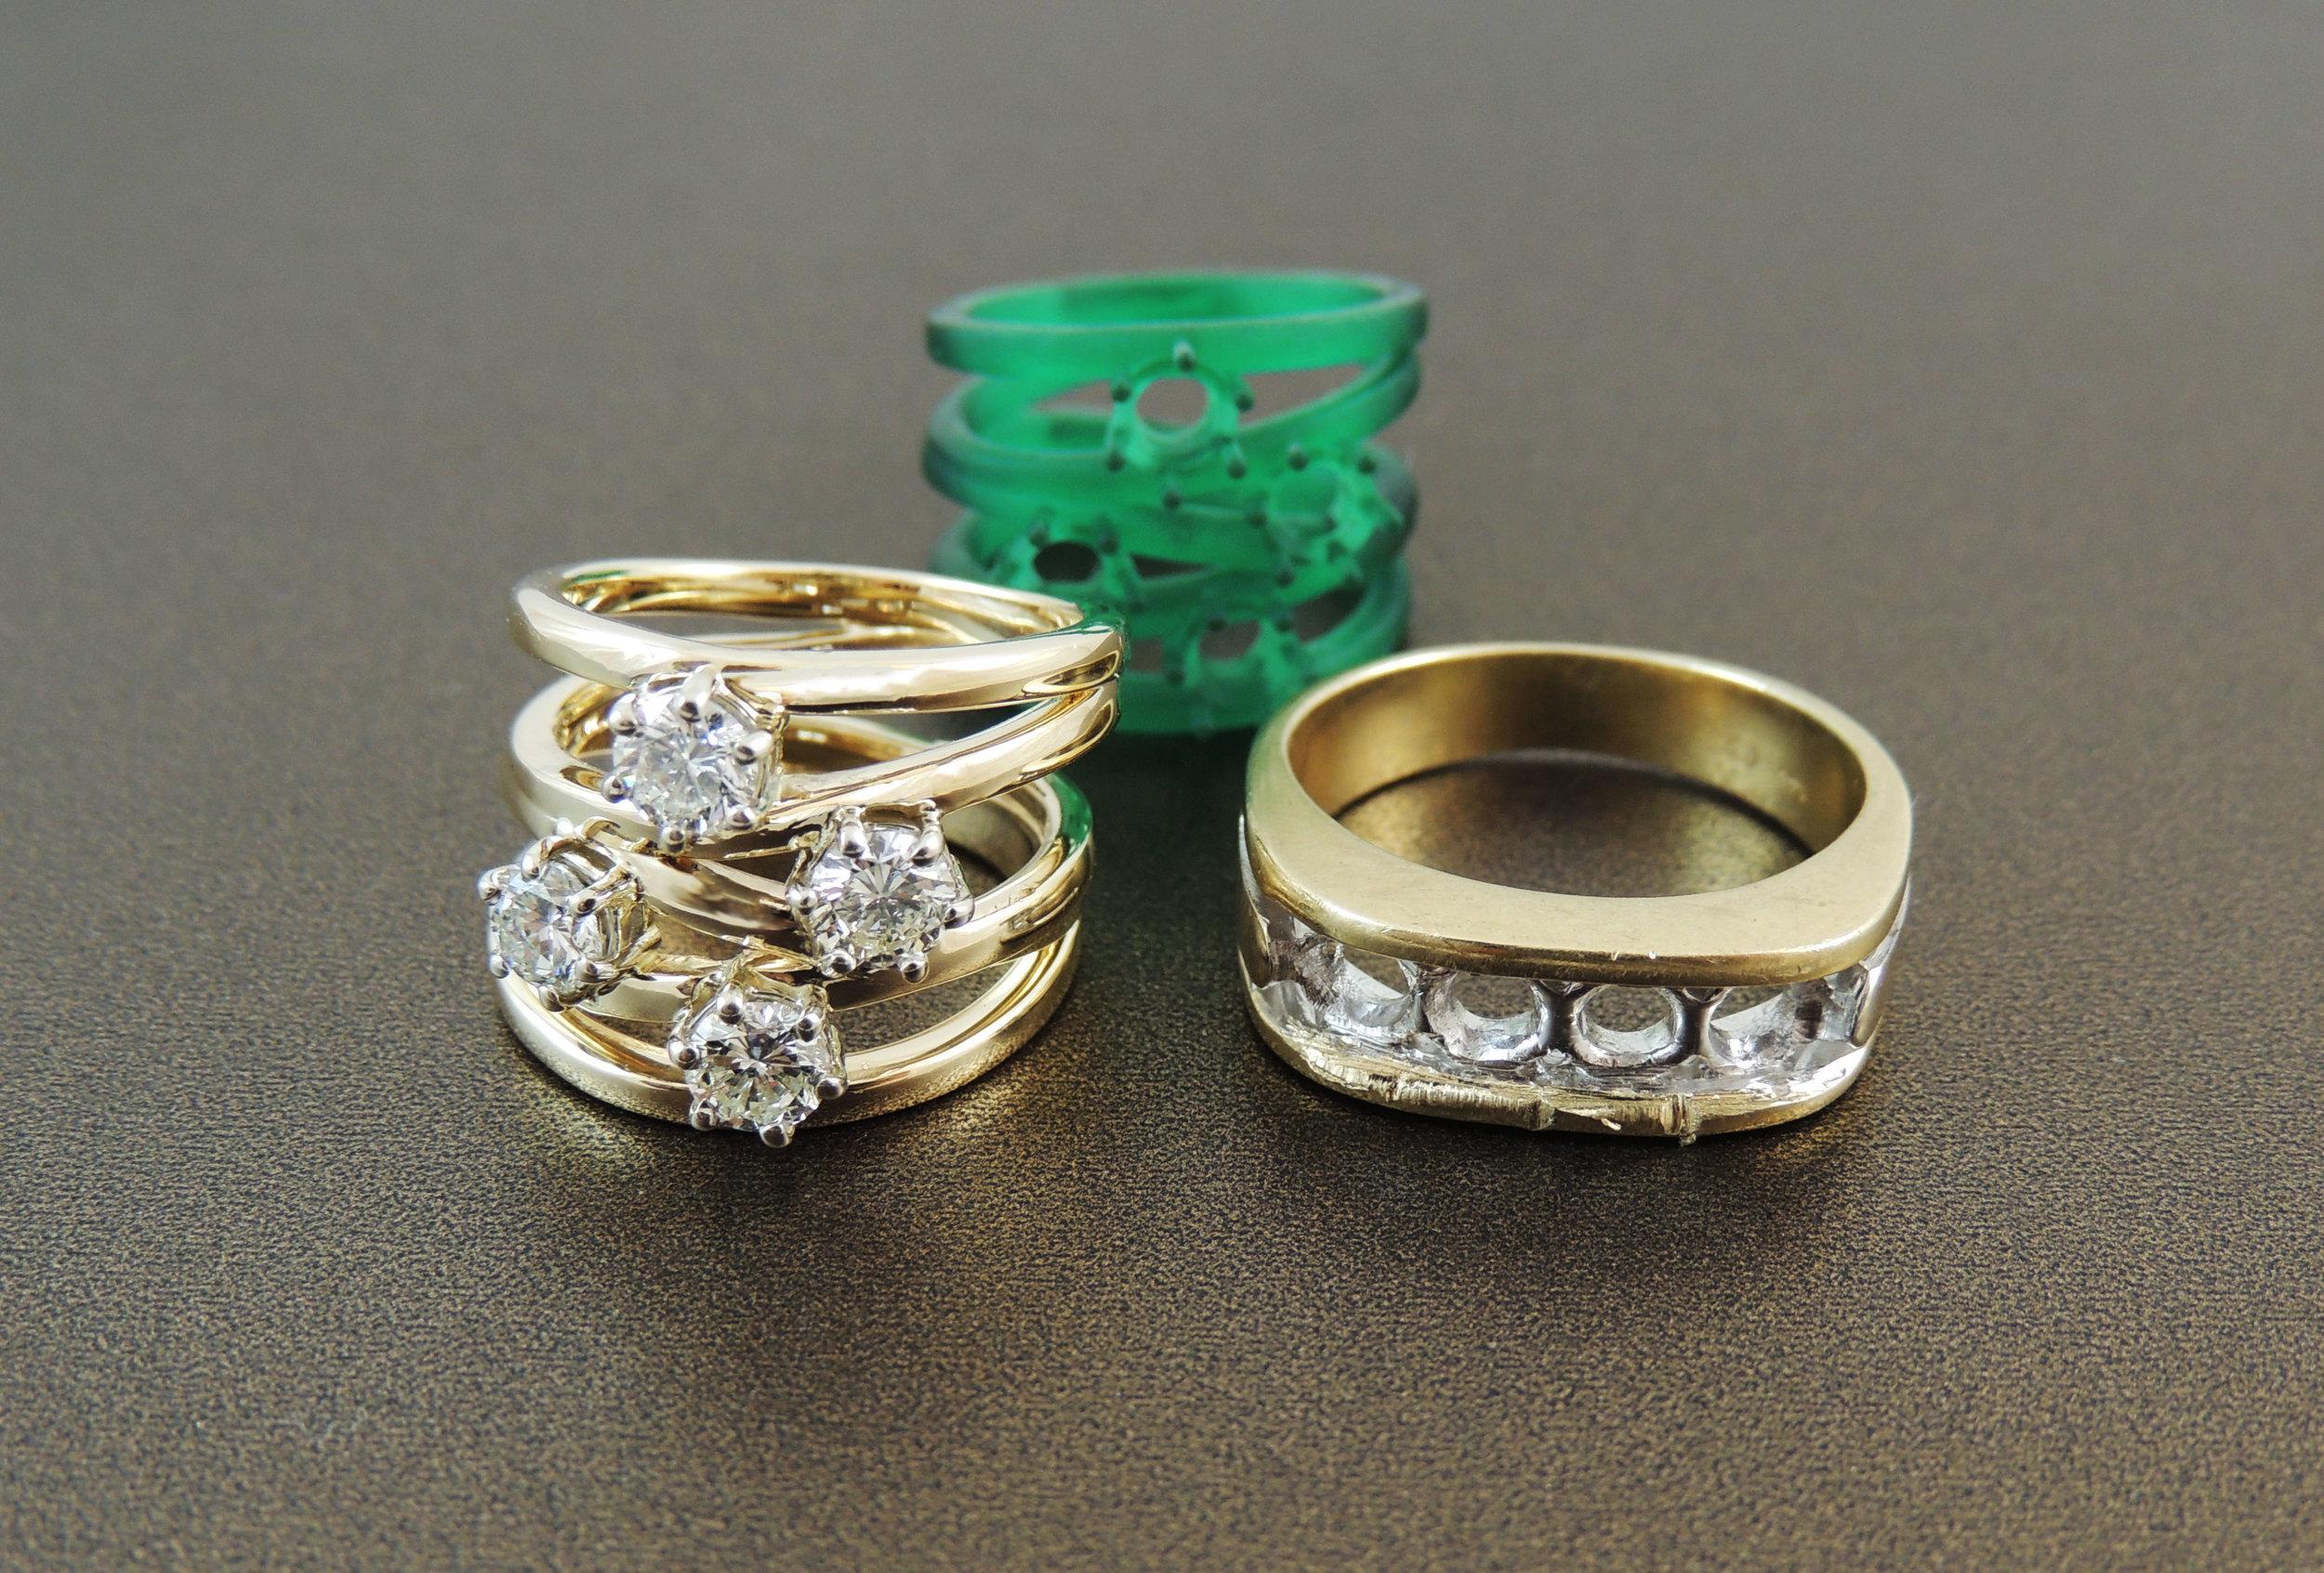 Redesign using sentimental diamonds